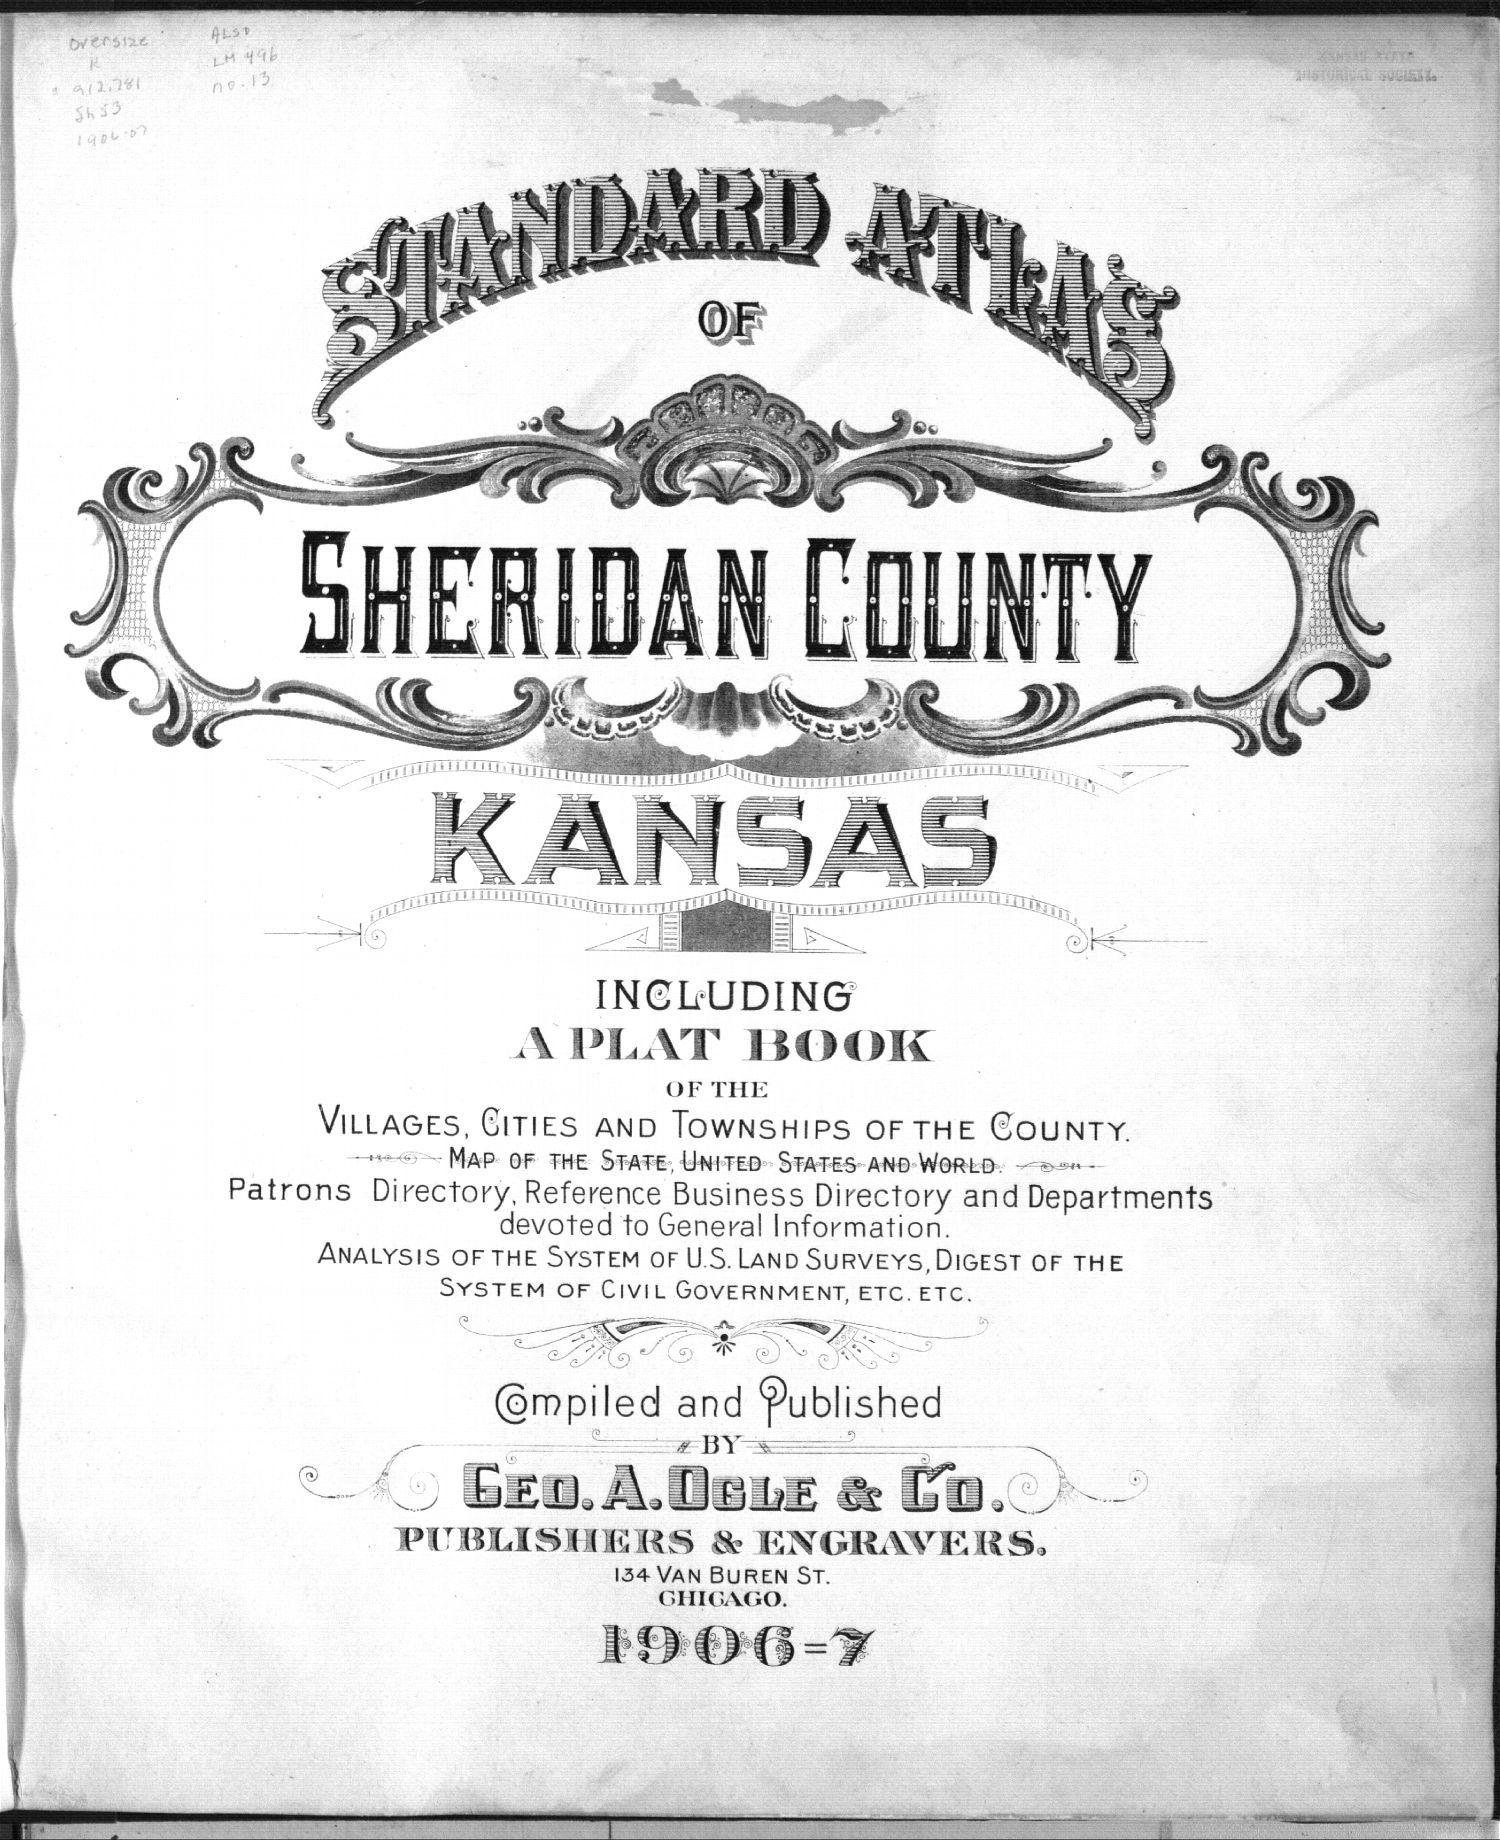 Standard atlas of Sheridan County, Kansas - 1